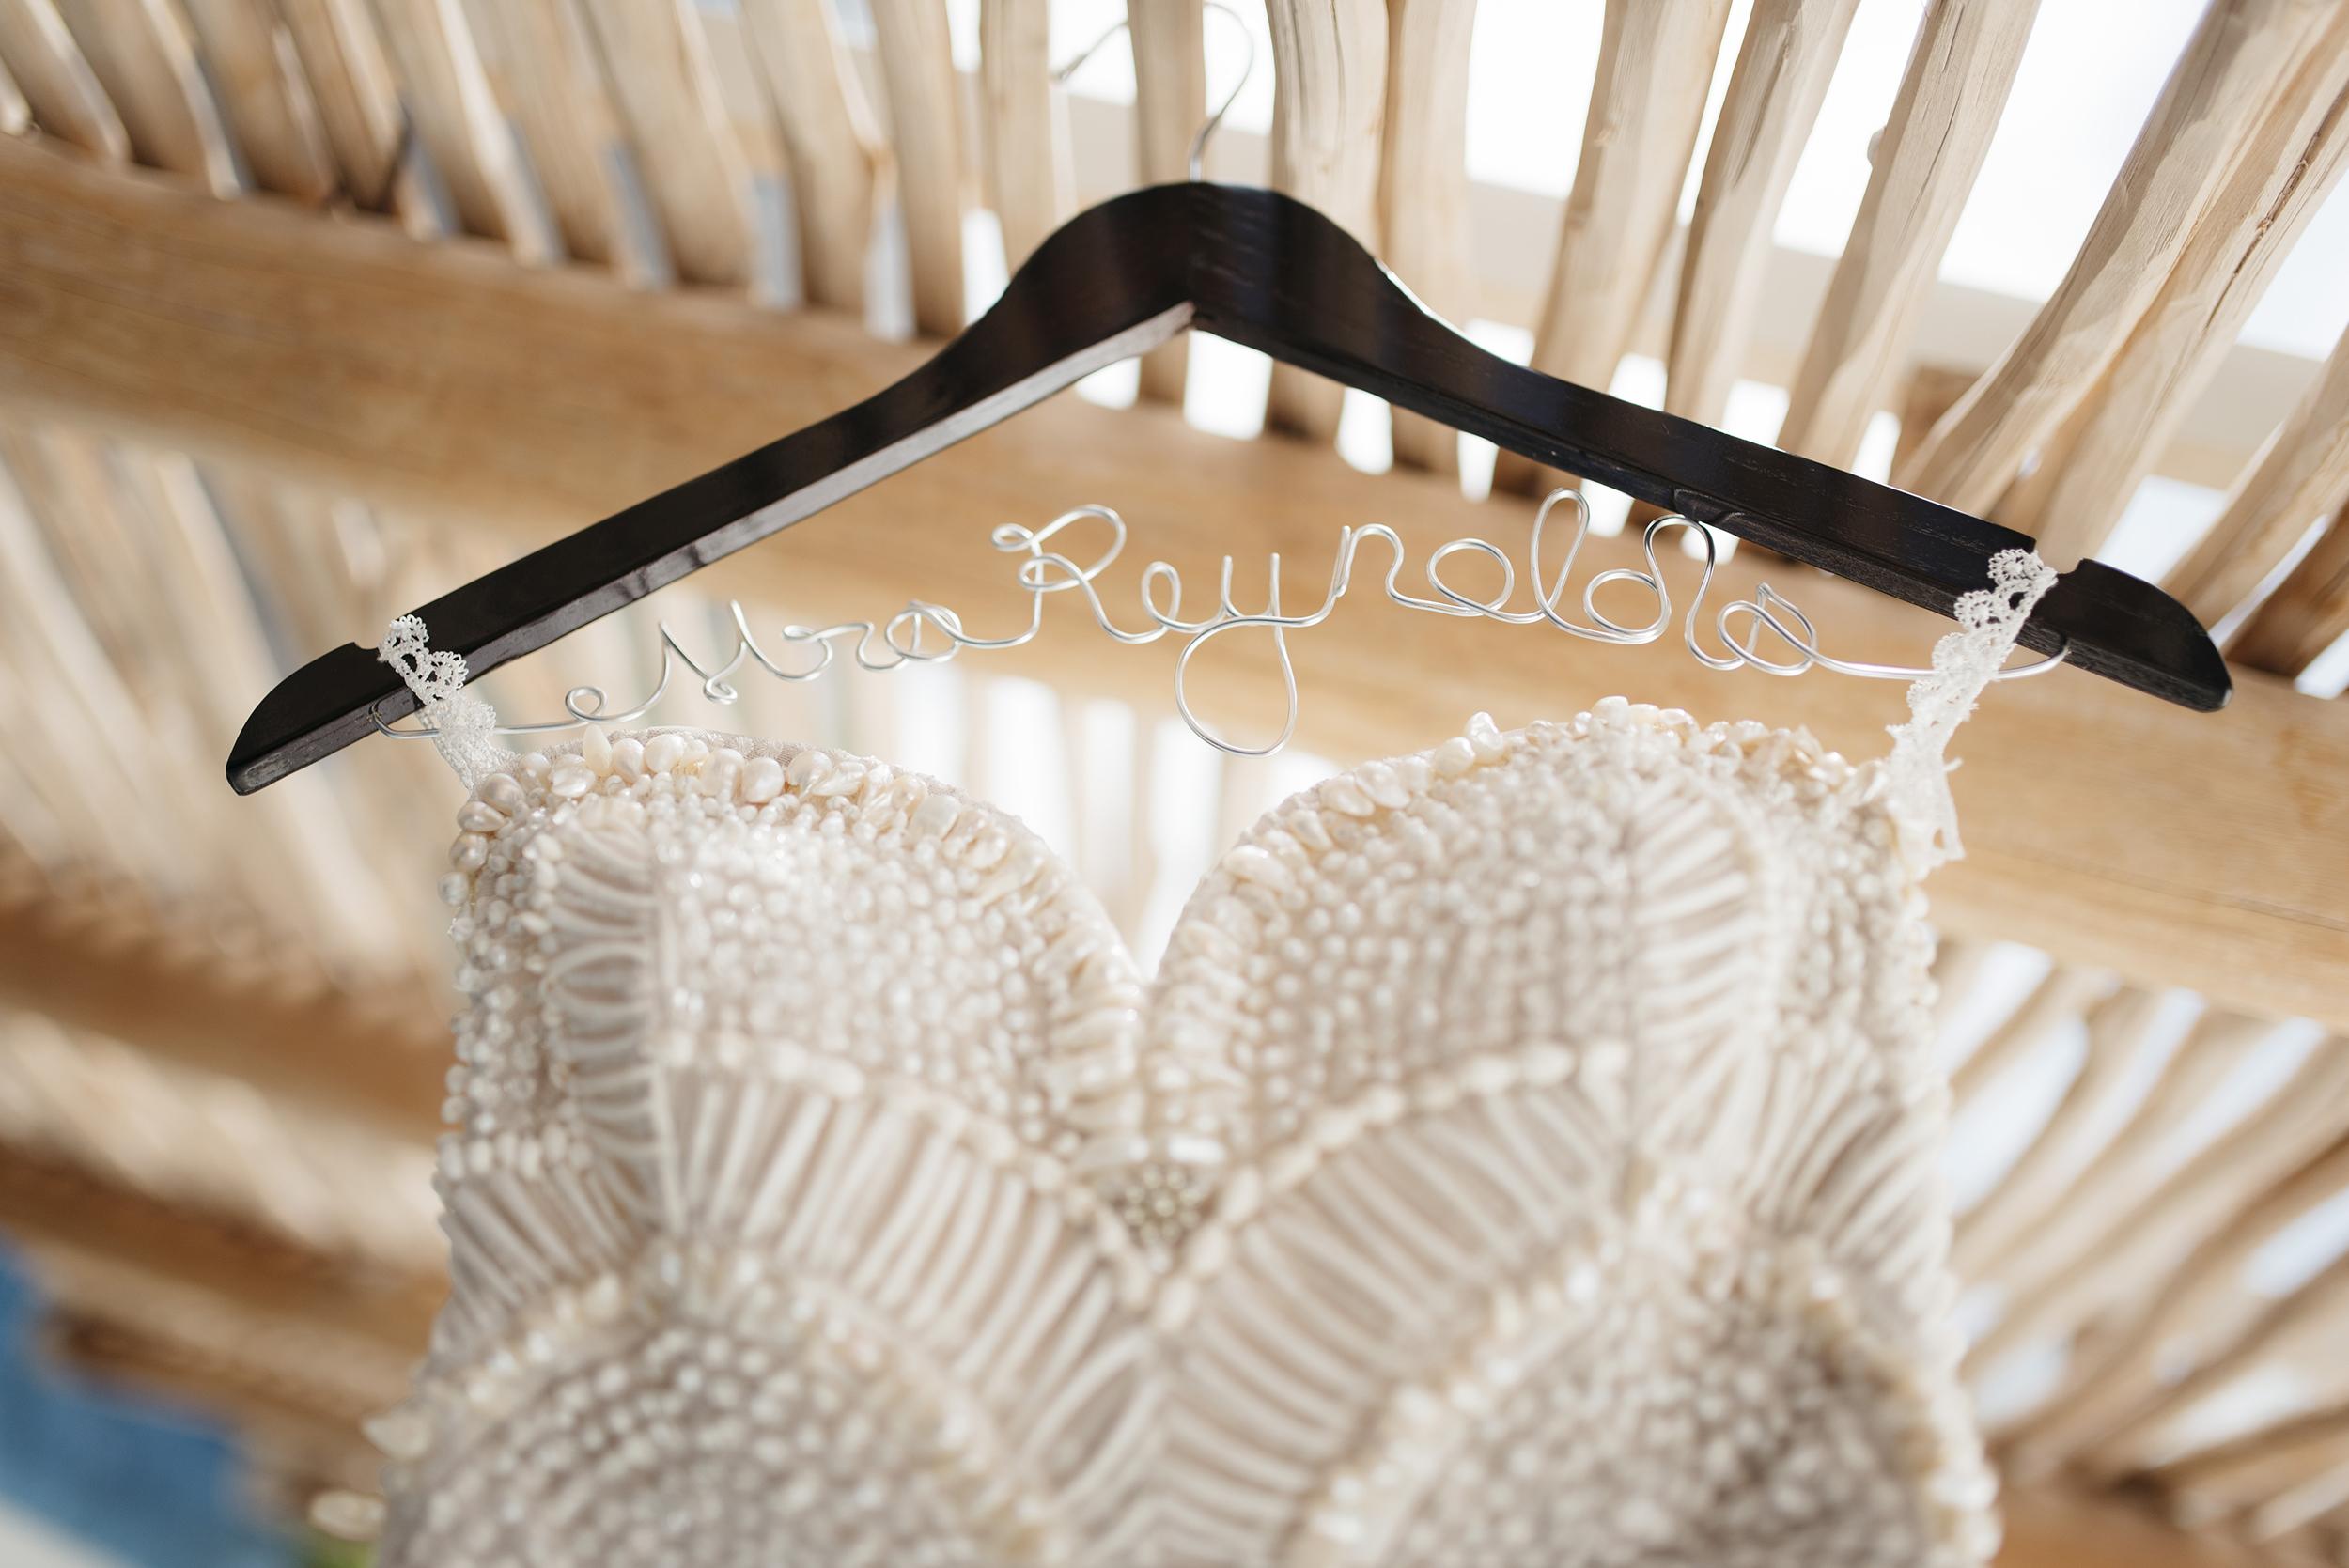 Handmade wedding dress for Sayulita Mexico Destination Wedding by Colby and Jess colbyandjess.com